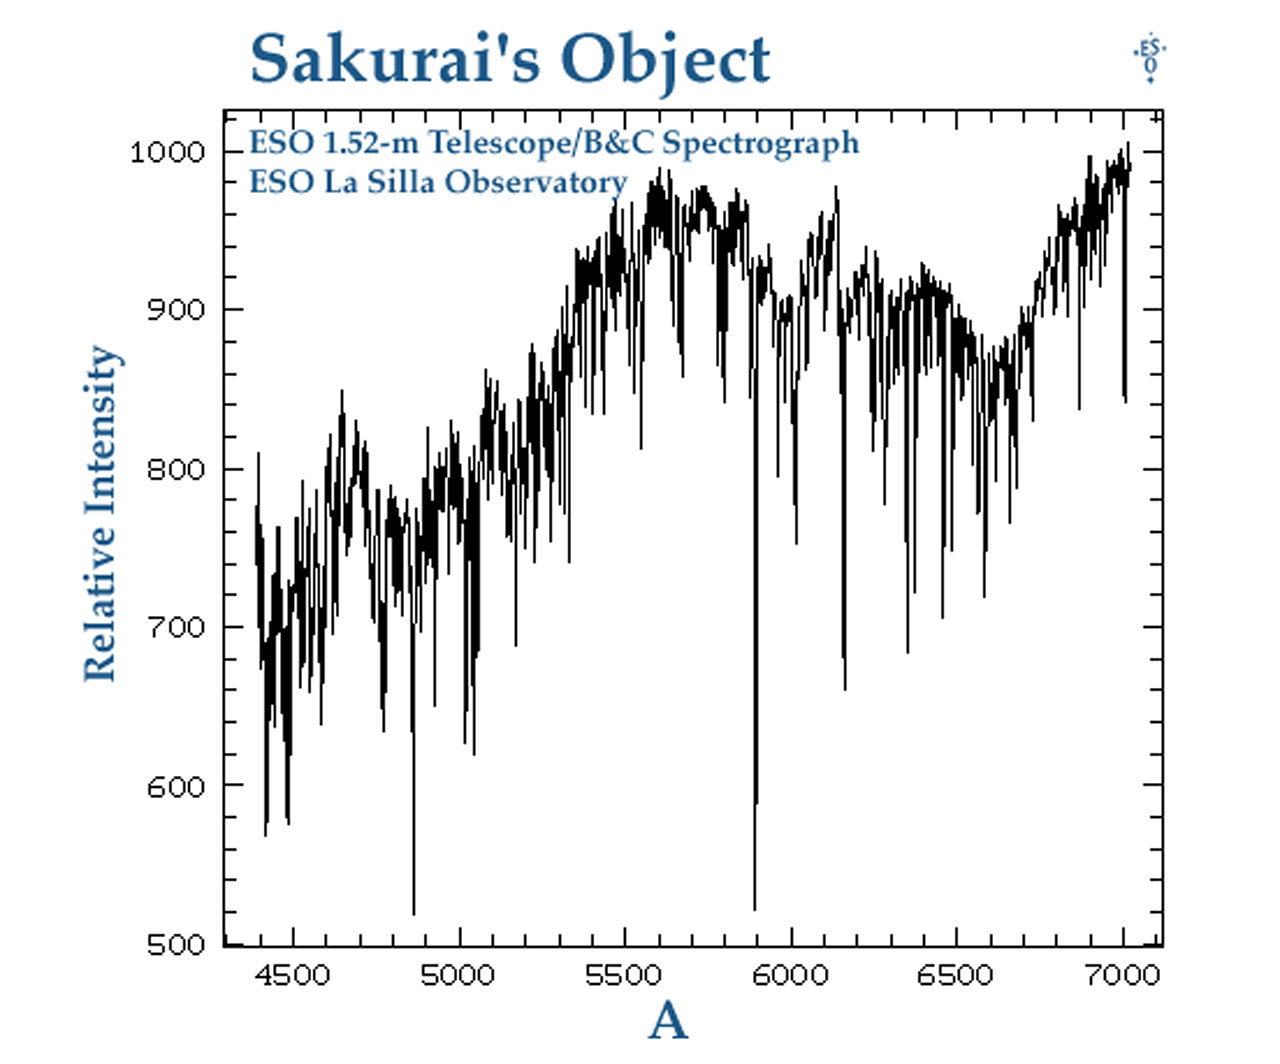 The Spectrum of Sakurai's Object